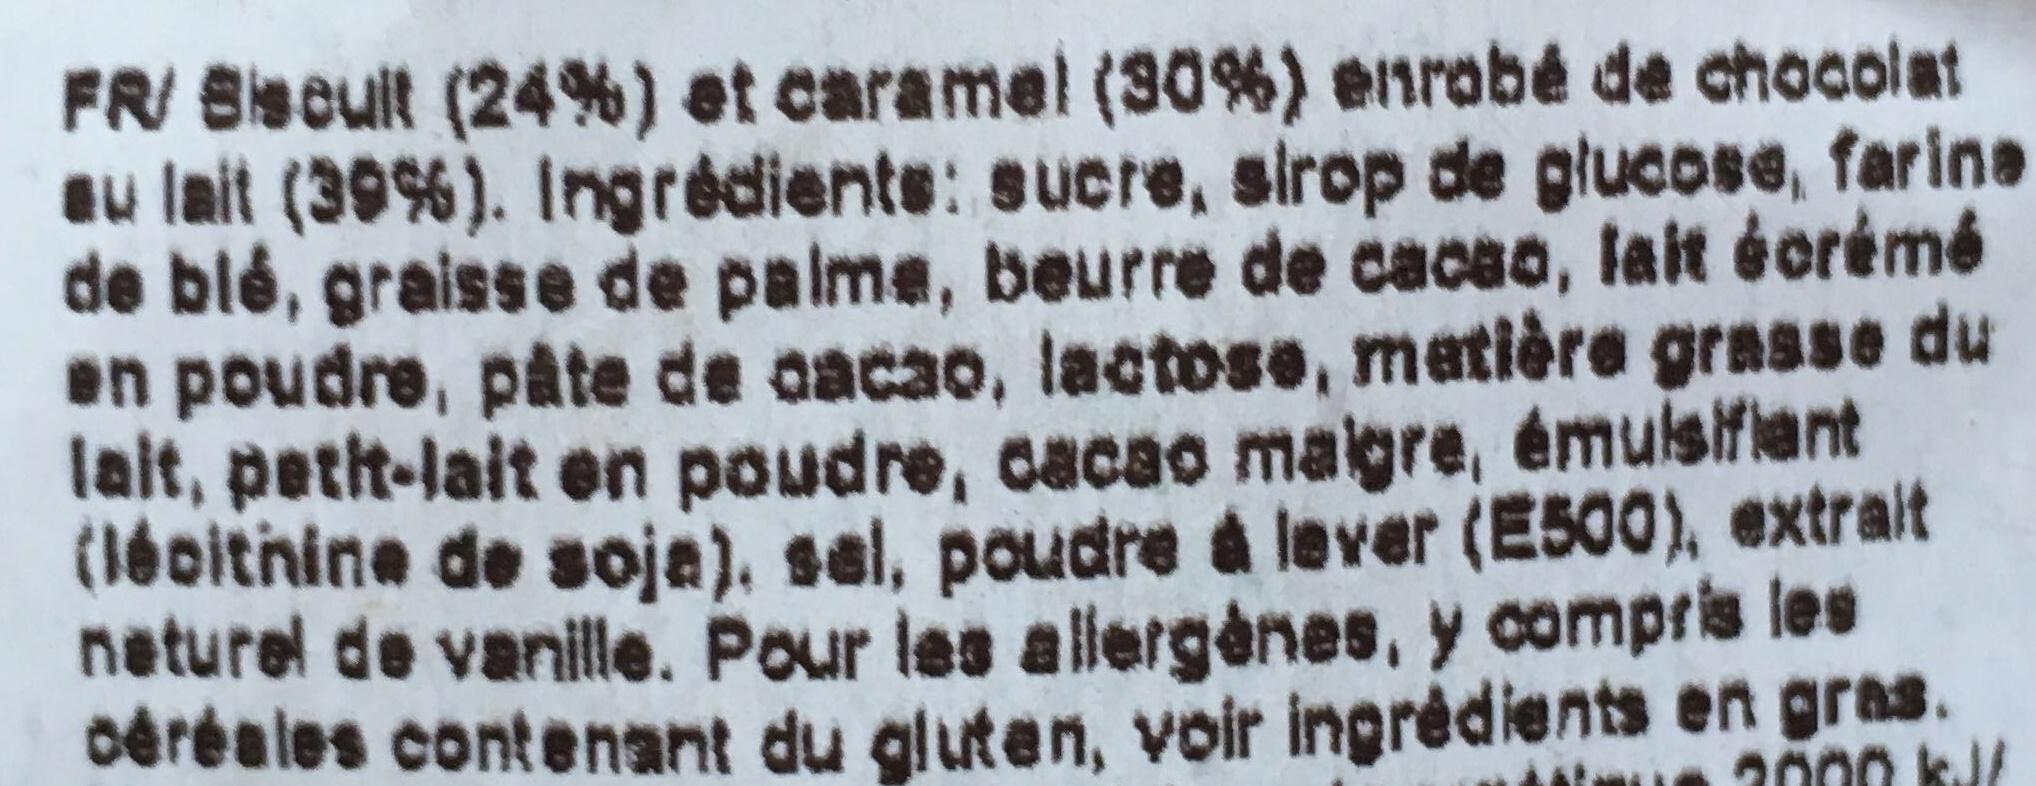 Twix Miniatures - Ingredientes - fr